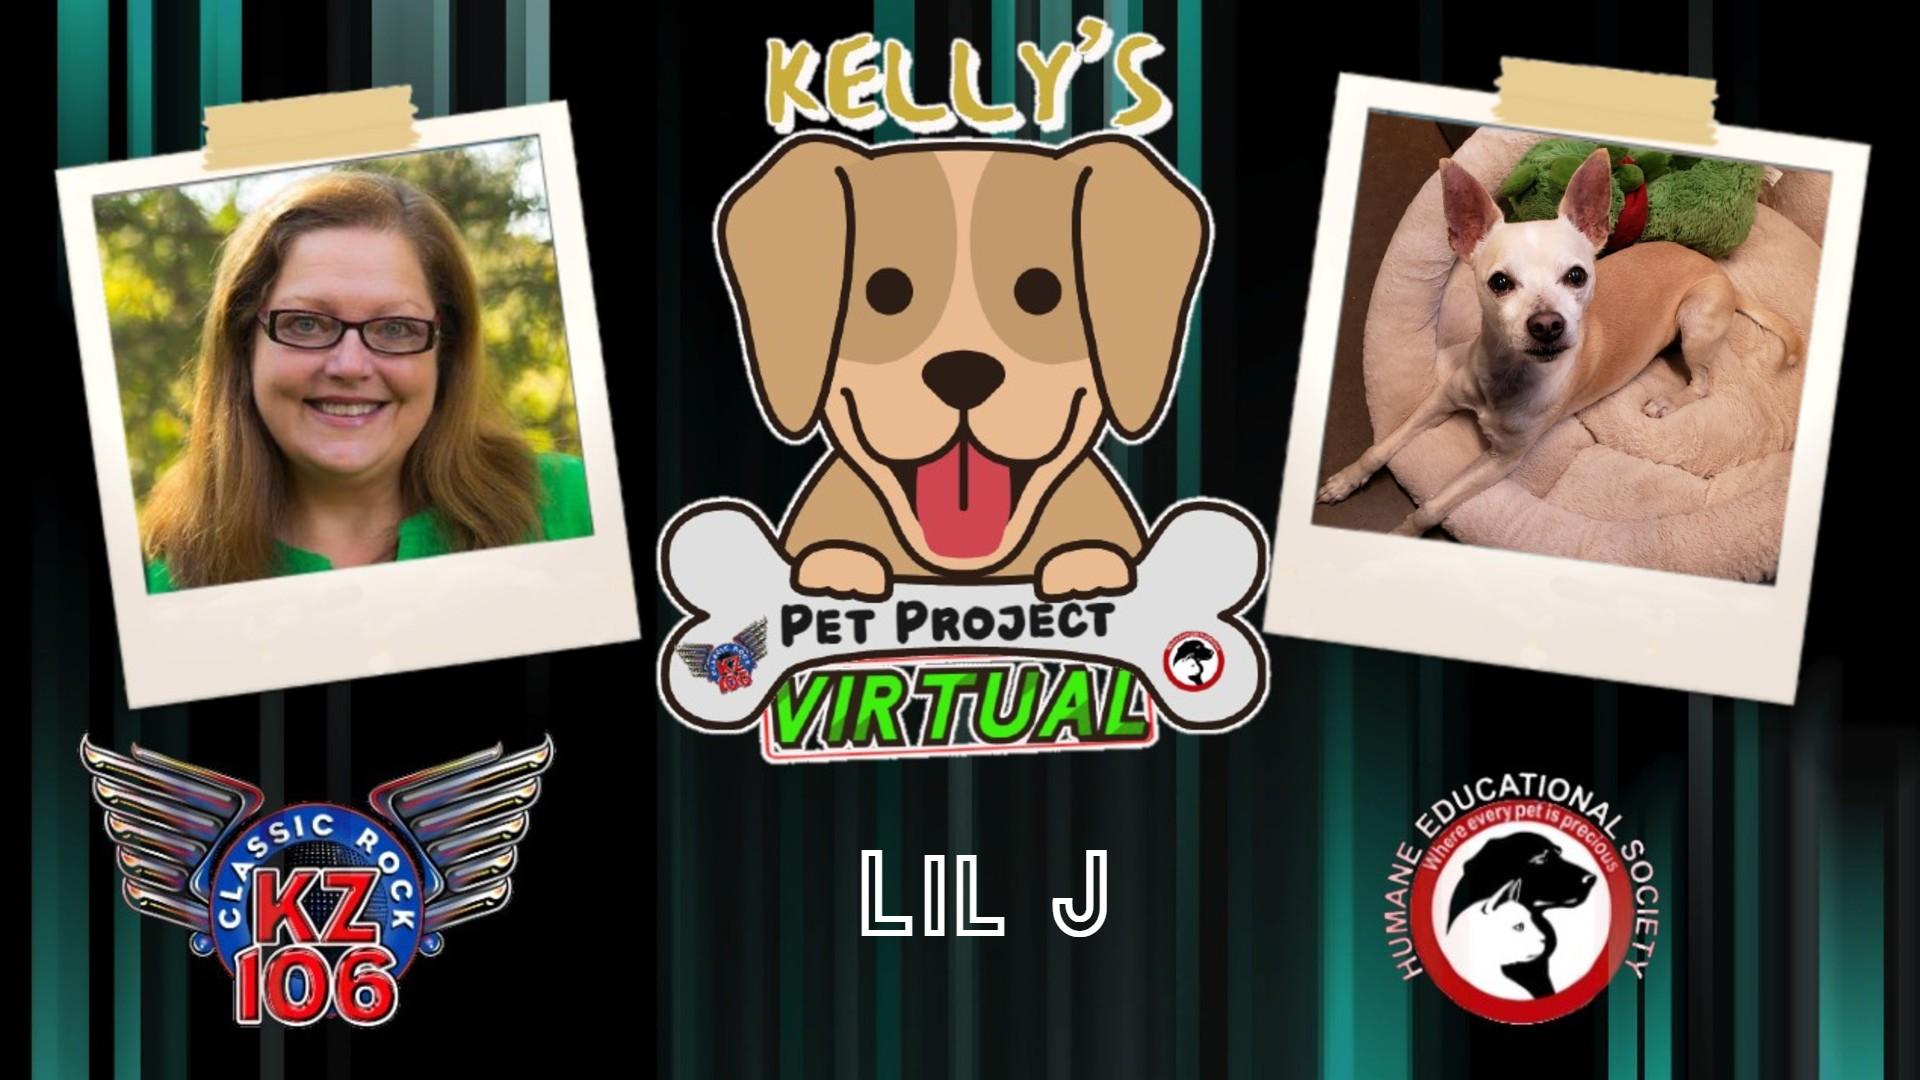 Kelly's Pet Project: Lil J